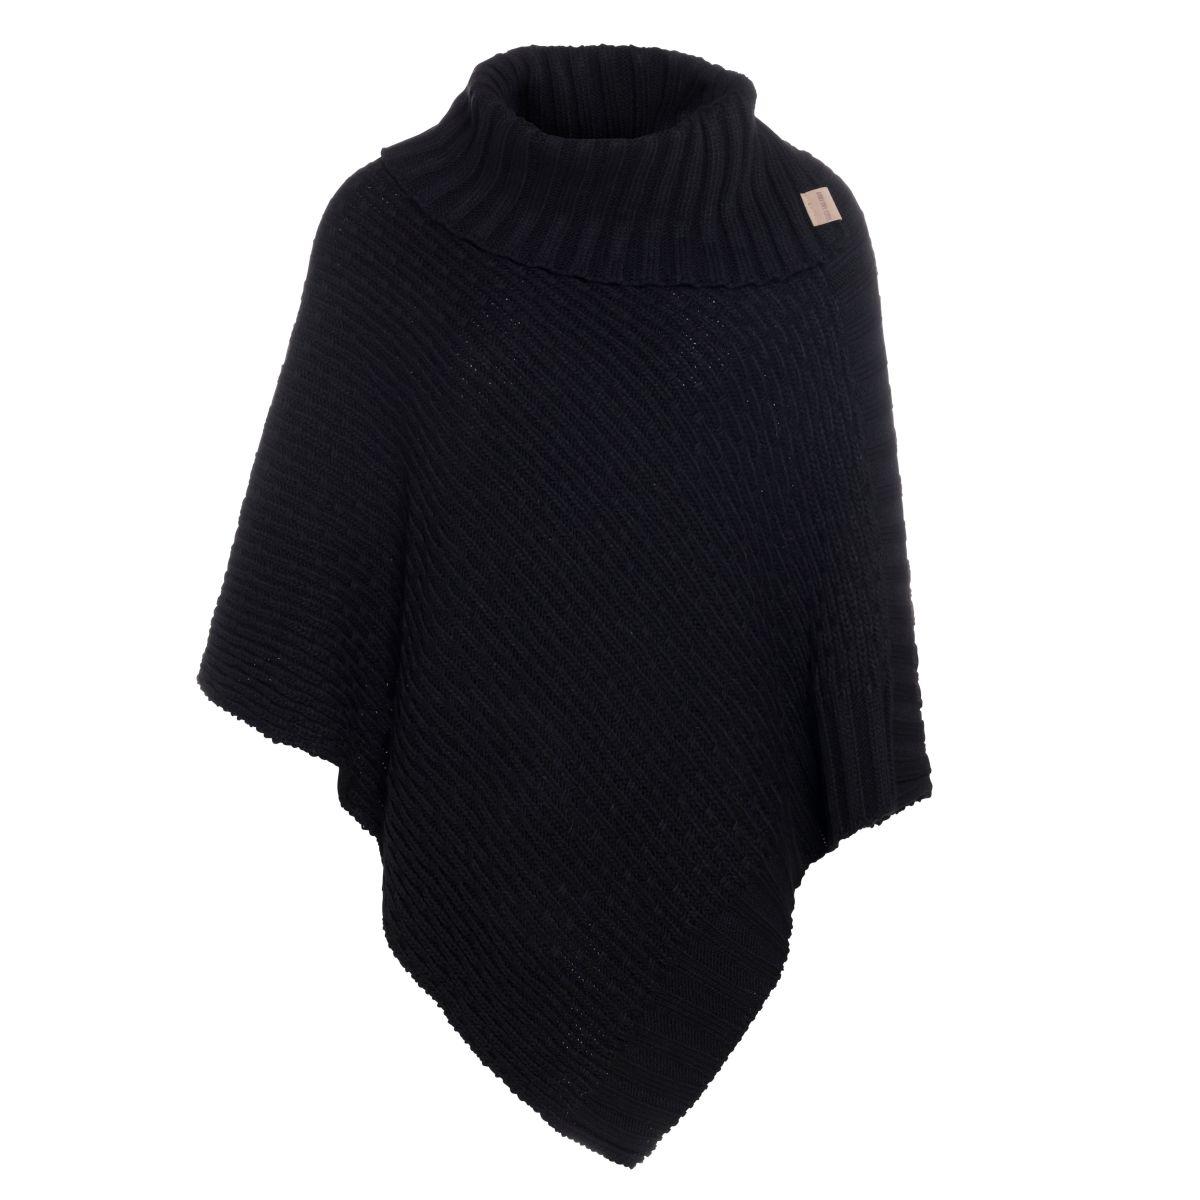 knit factory kf14806200050 nicky gebreide poncho zwart 1